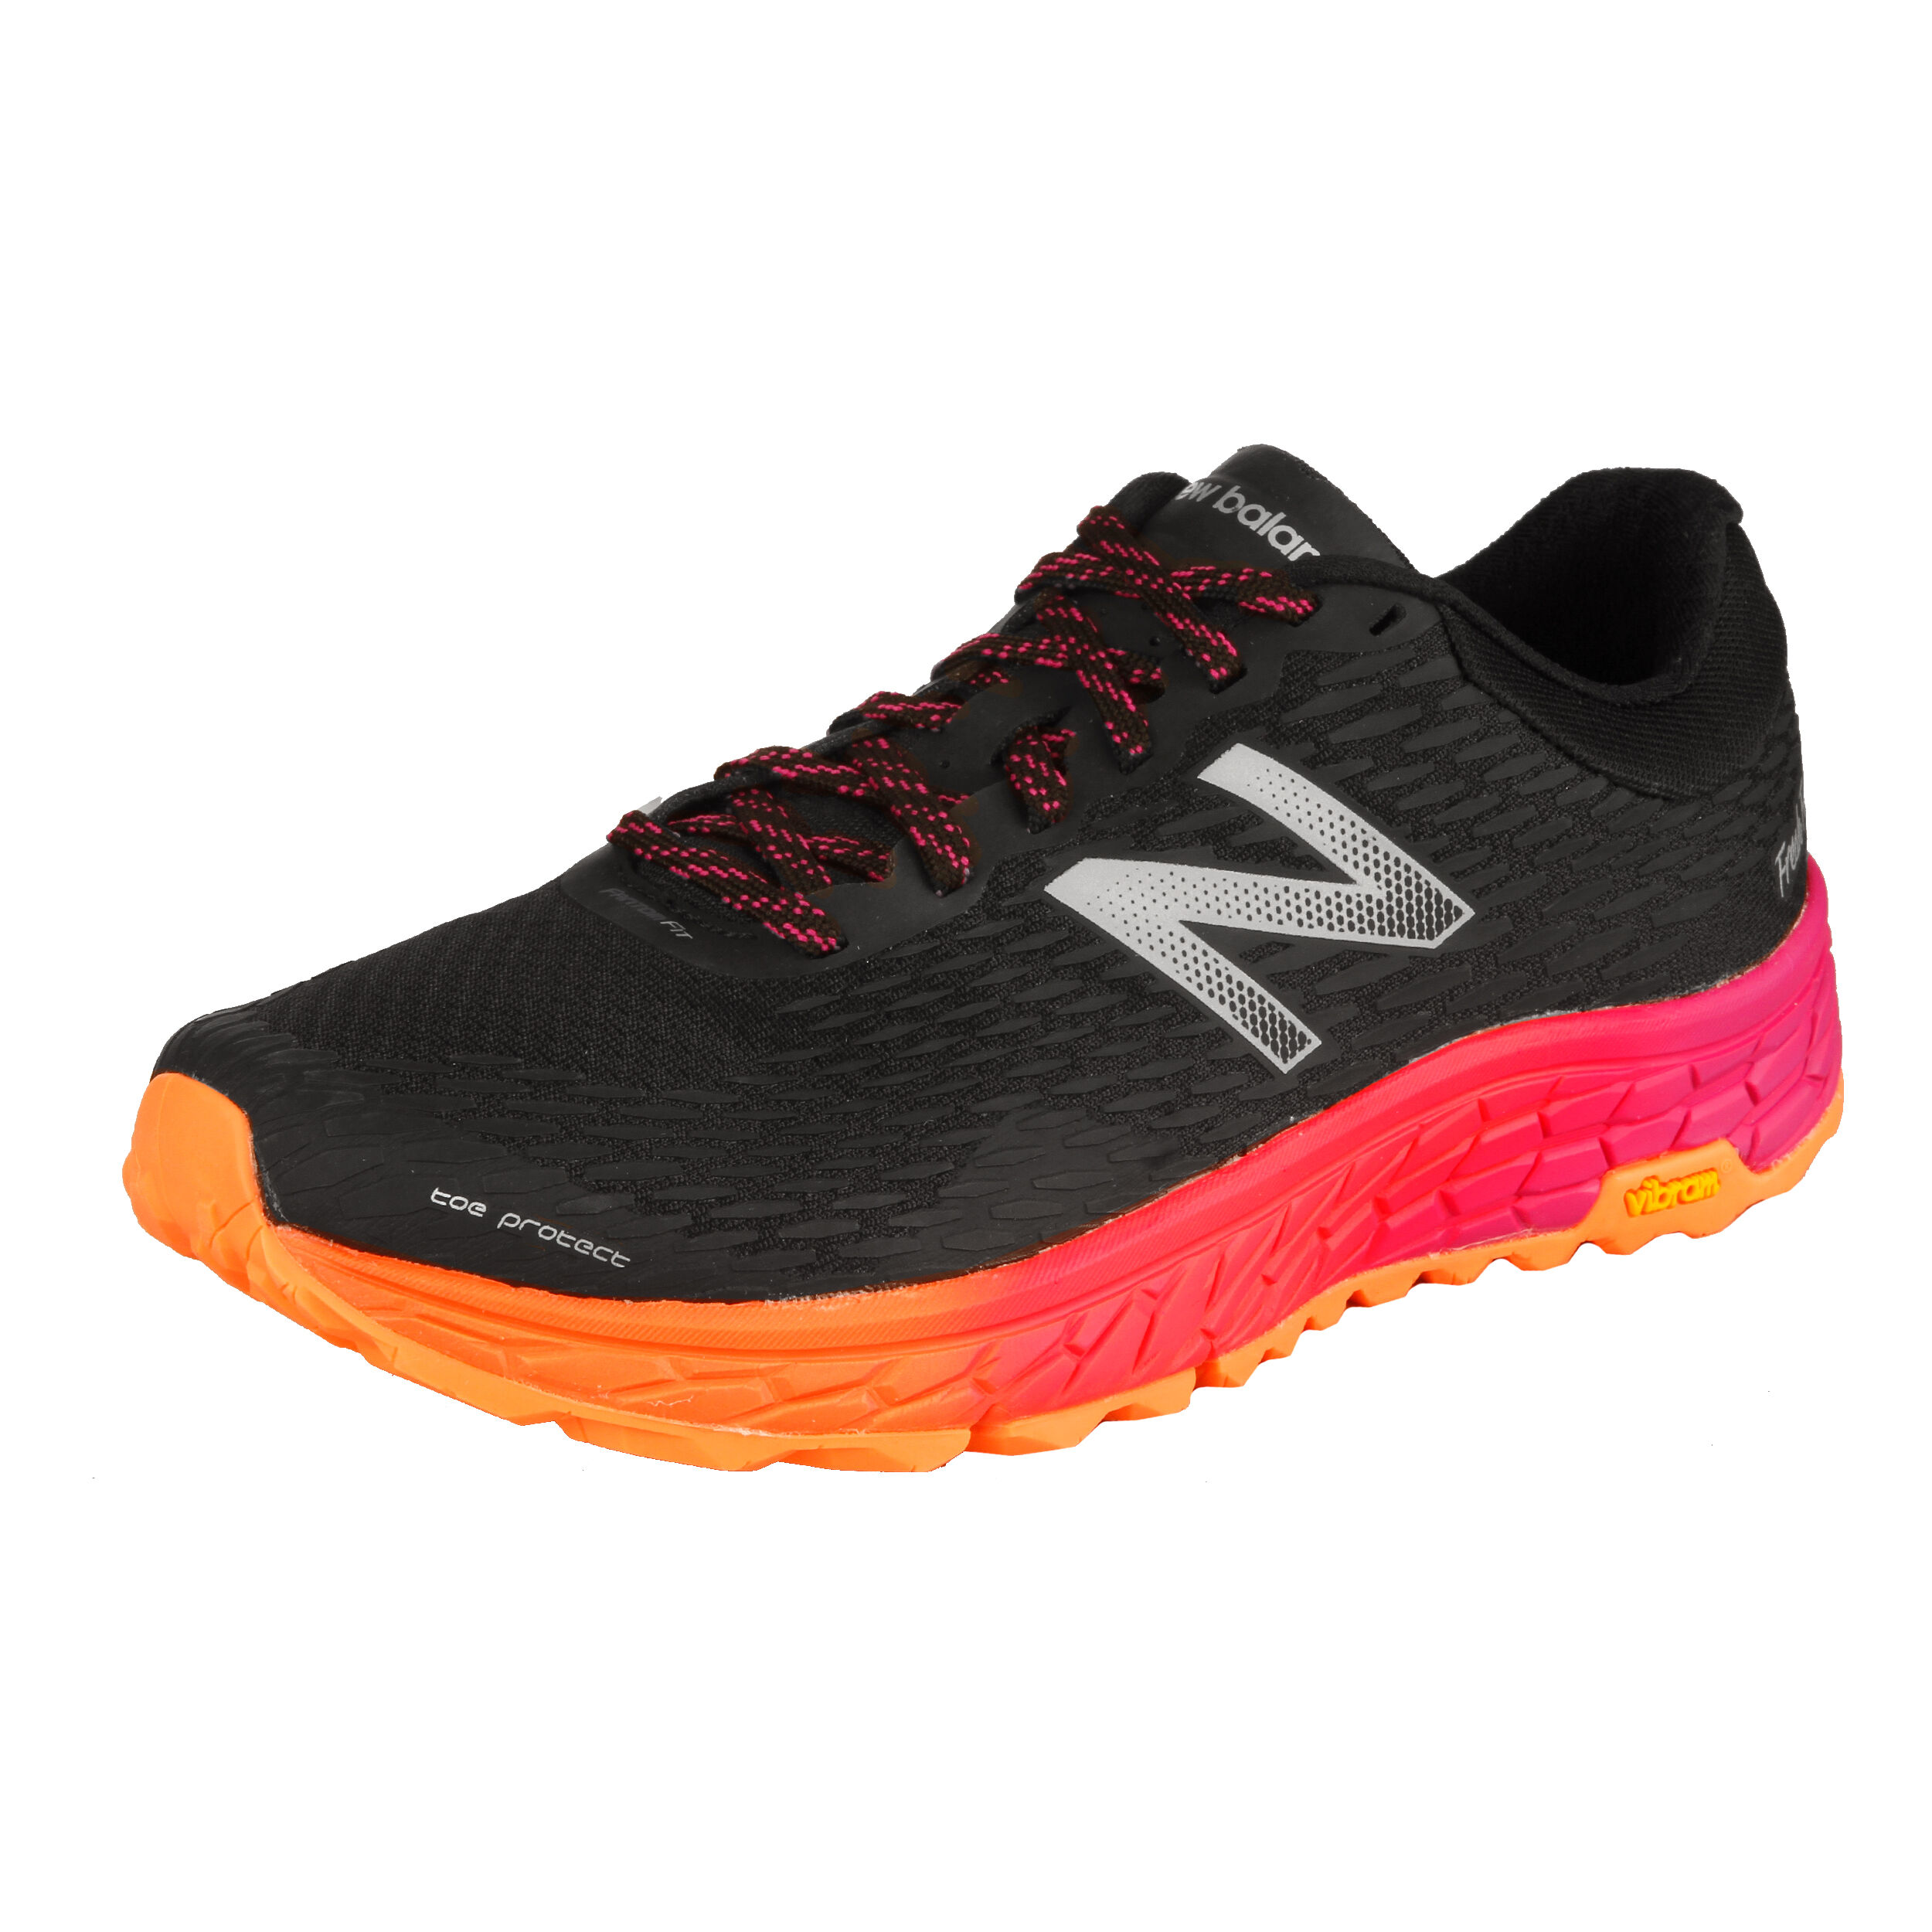 Laufschuhe New Balance Fresh Foam Hierro v2 schwarzpink Damen